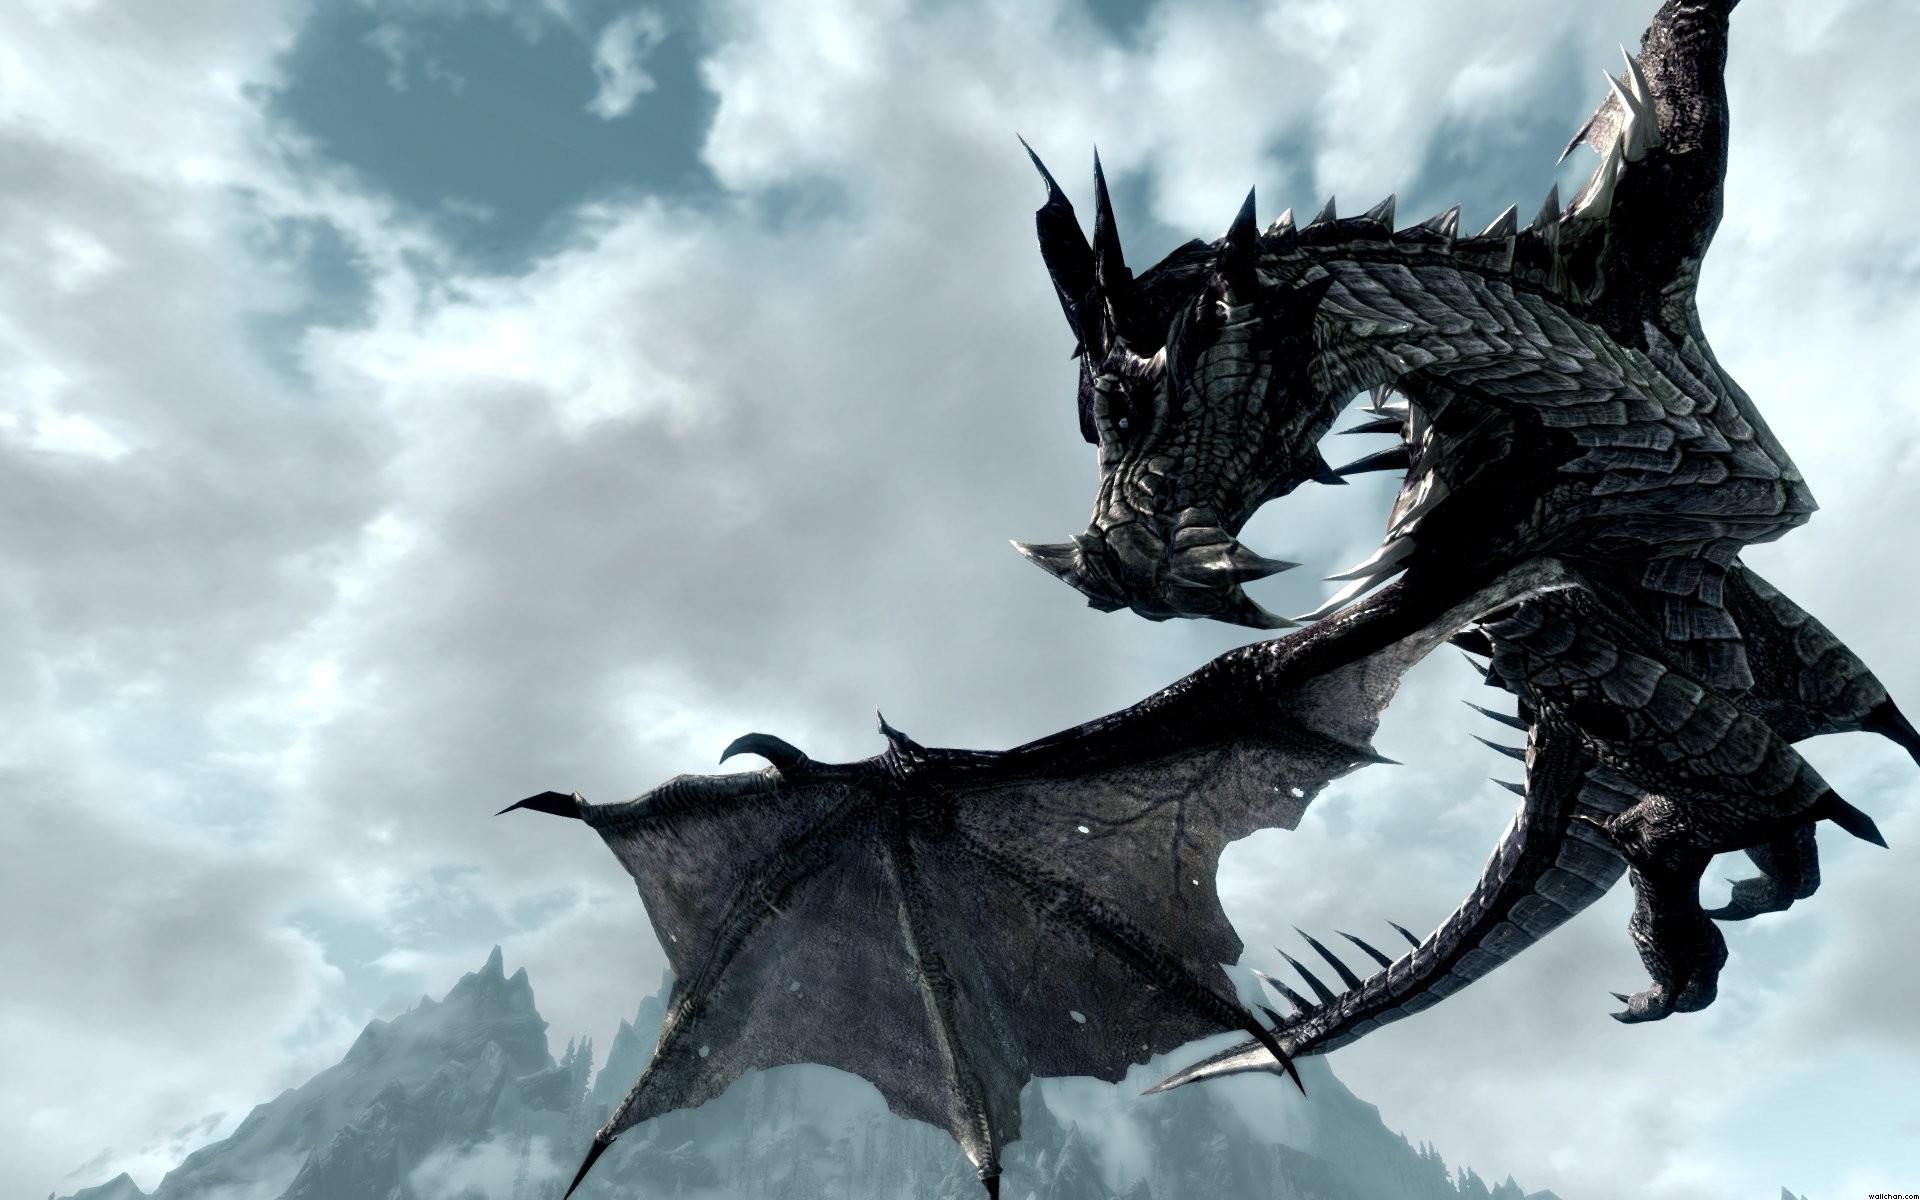 Black Dragon Wallpaper Desktop (65+ Images